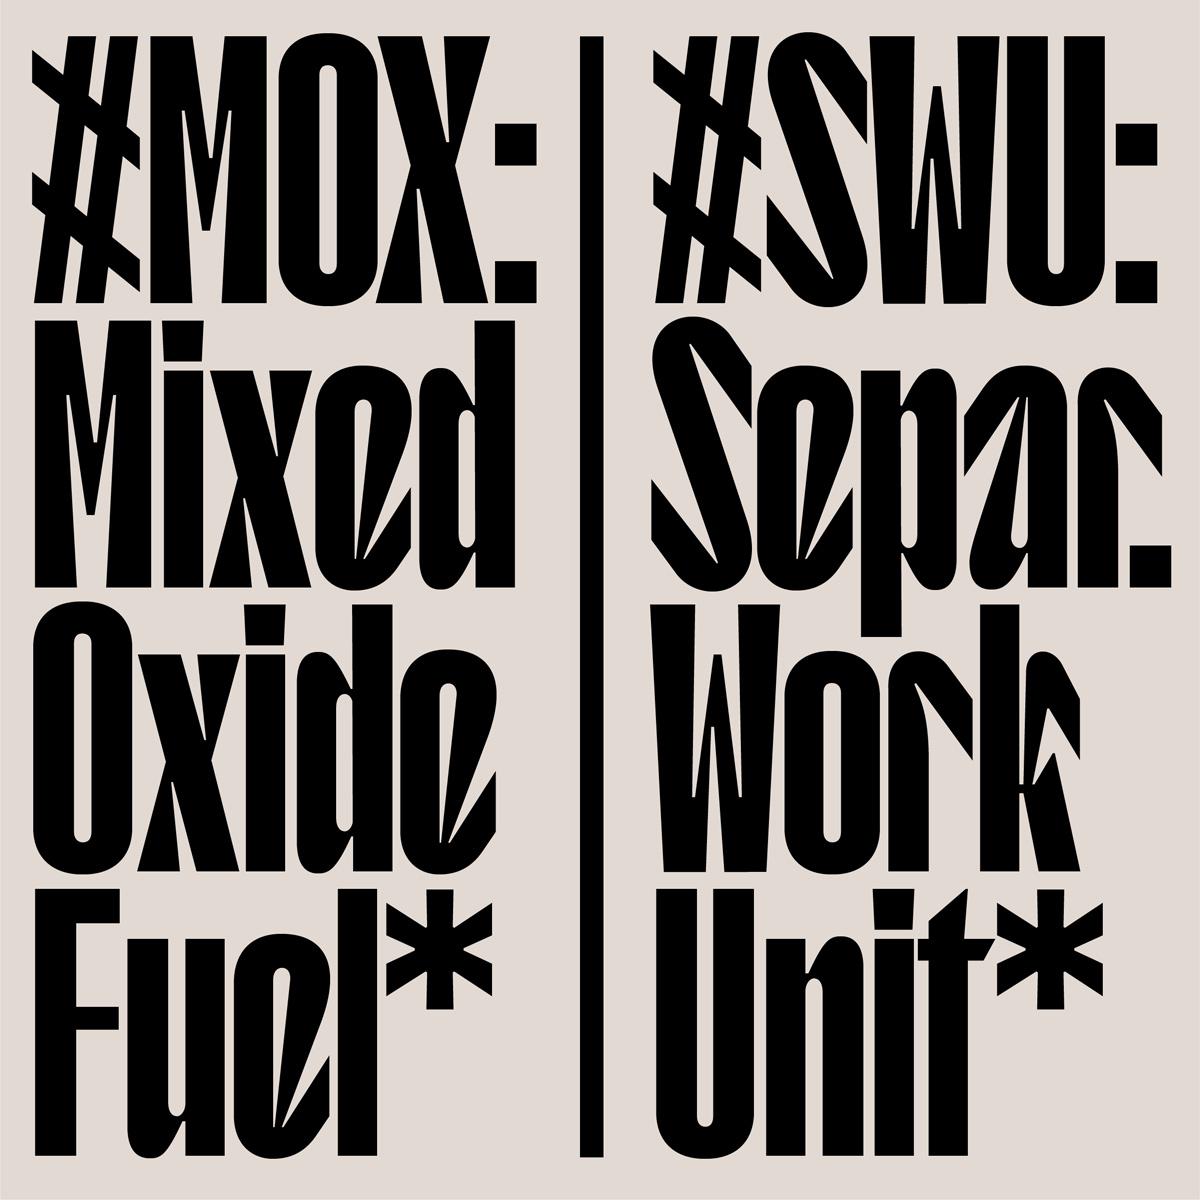 08 collide24 TYPE01 Valerio Monopoli - Valerio Monopoli and TYPE01 release their typeface Korium, a contemporary sans with angular shapes and a badass attitude